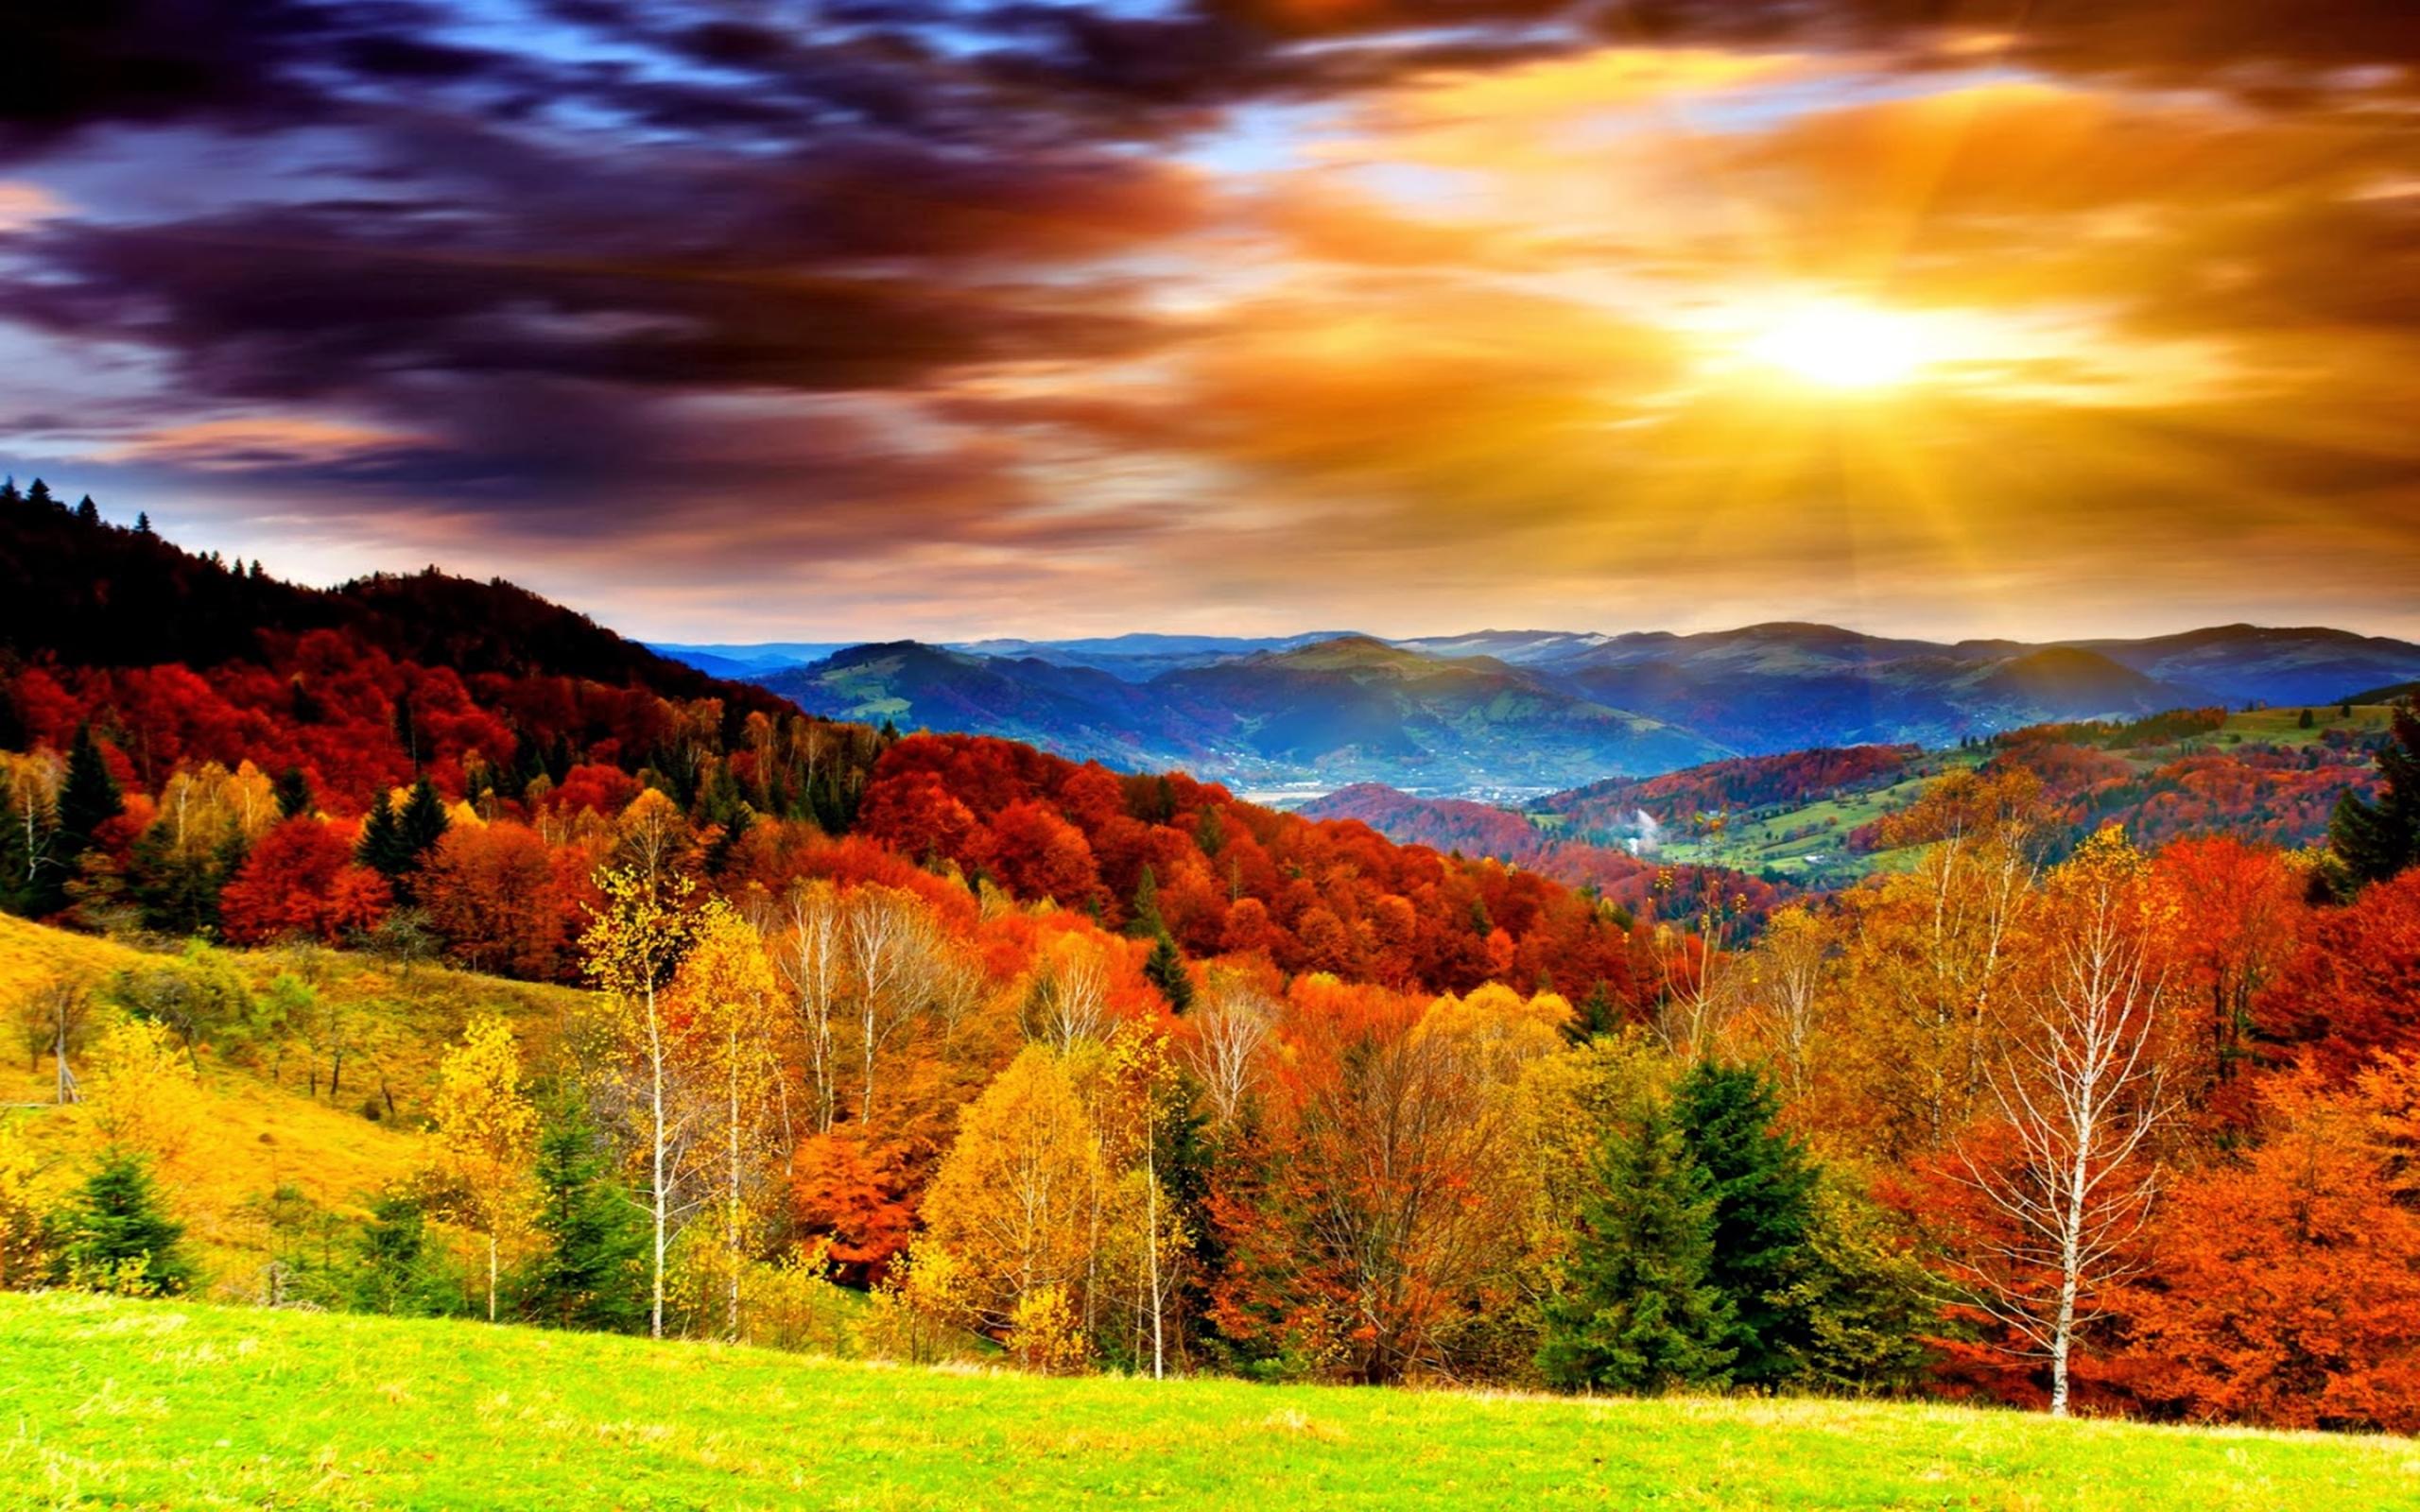 Top Beautiful Wallpapers Hd Widescreen Wallpapers 2560x1600